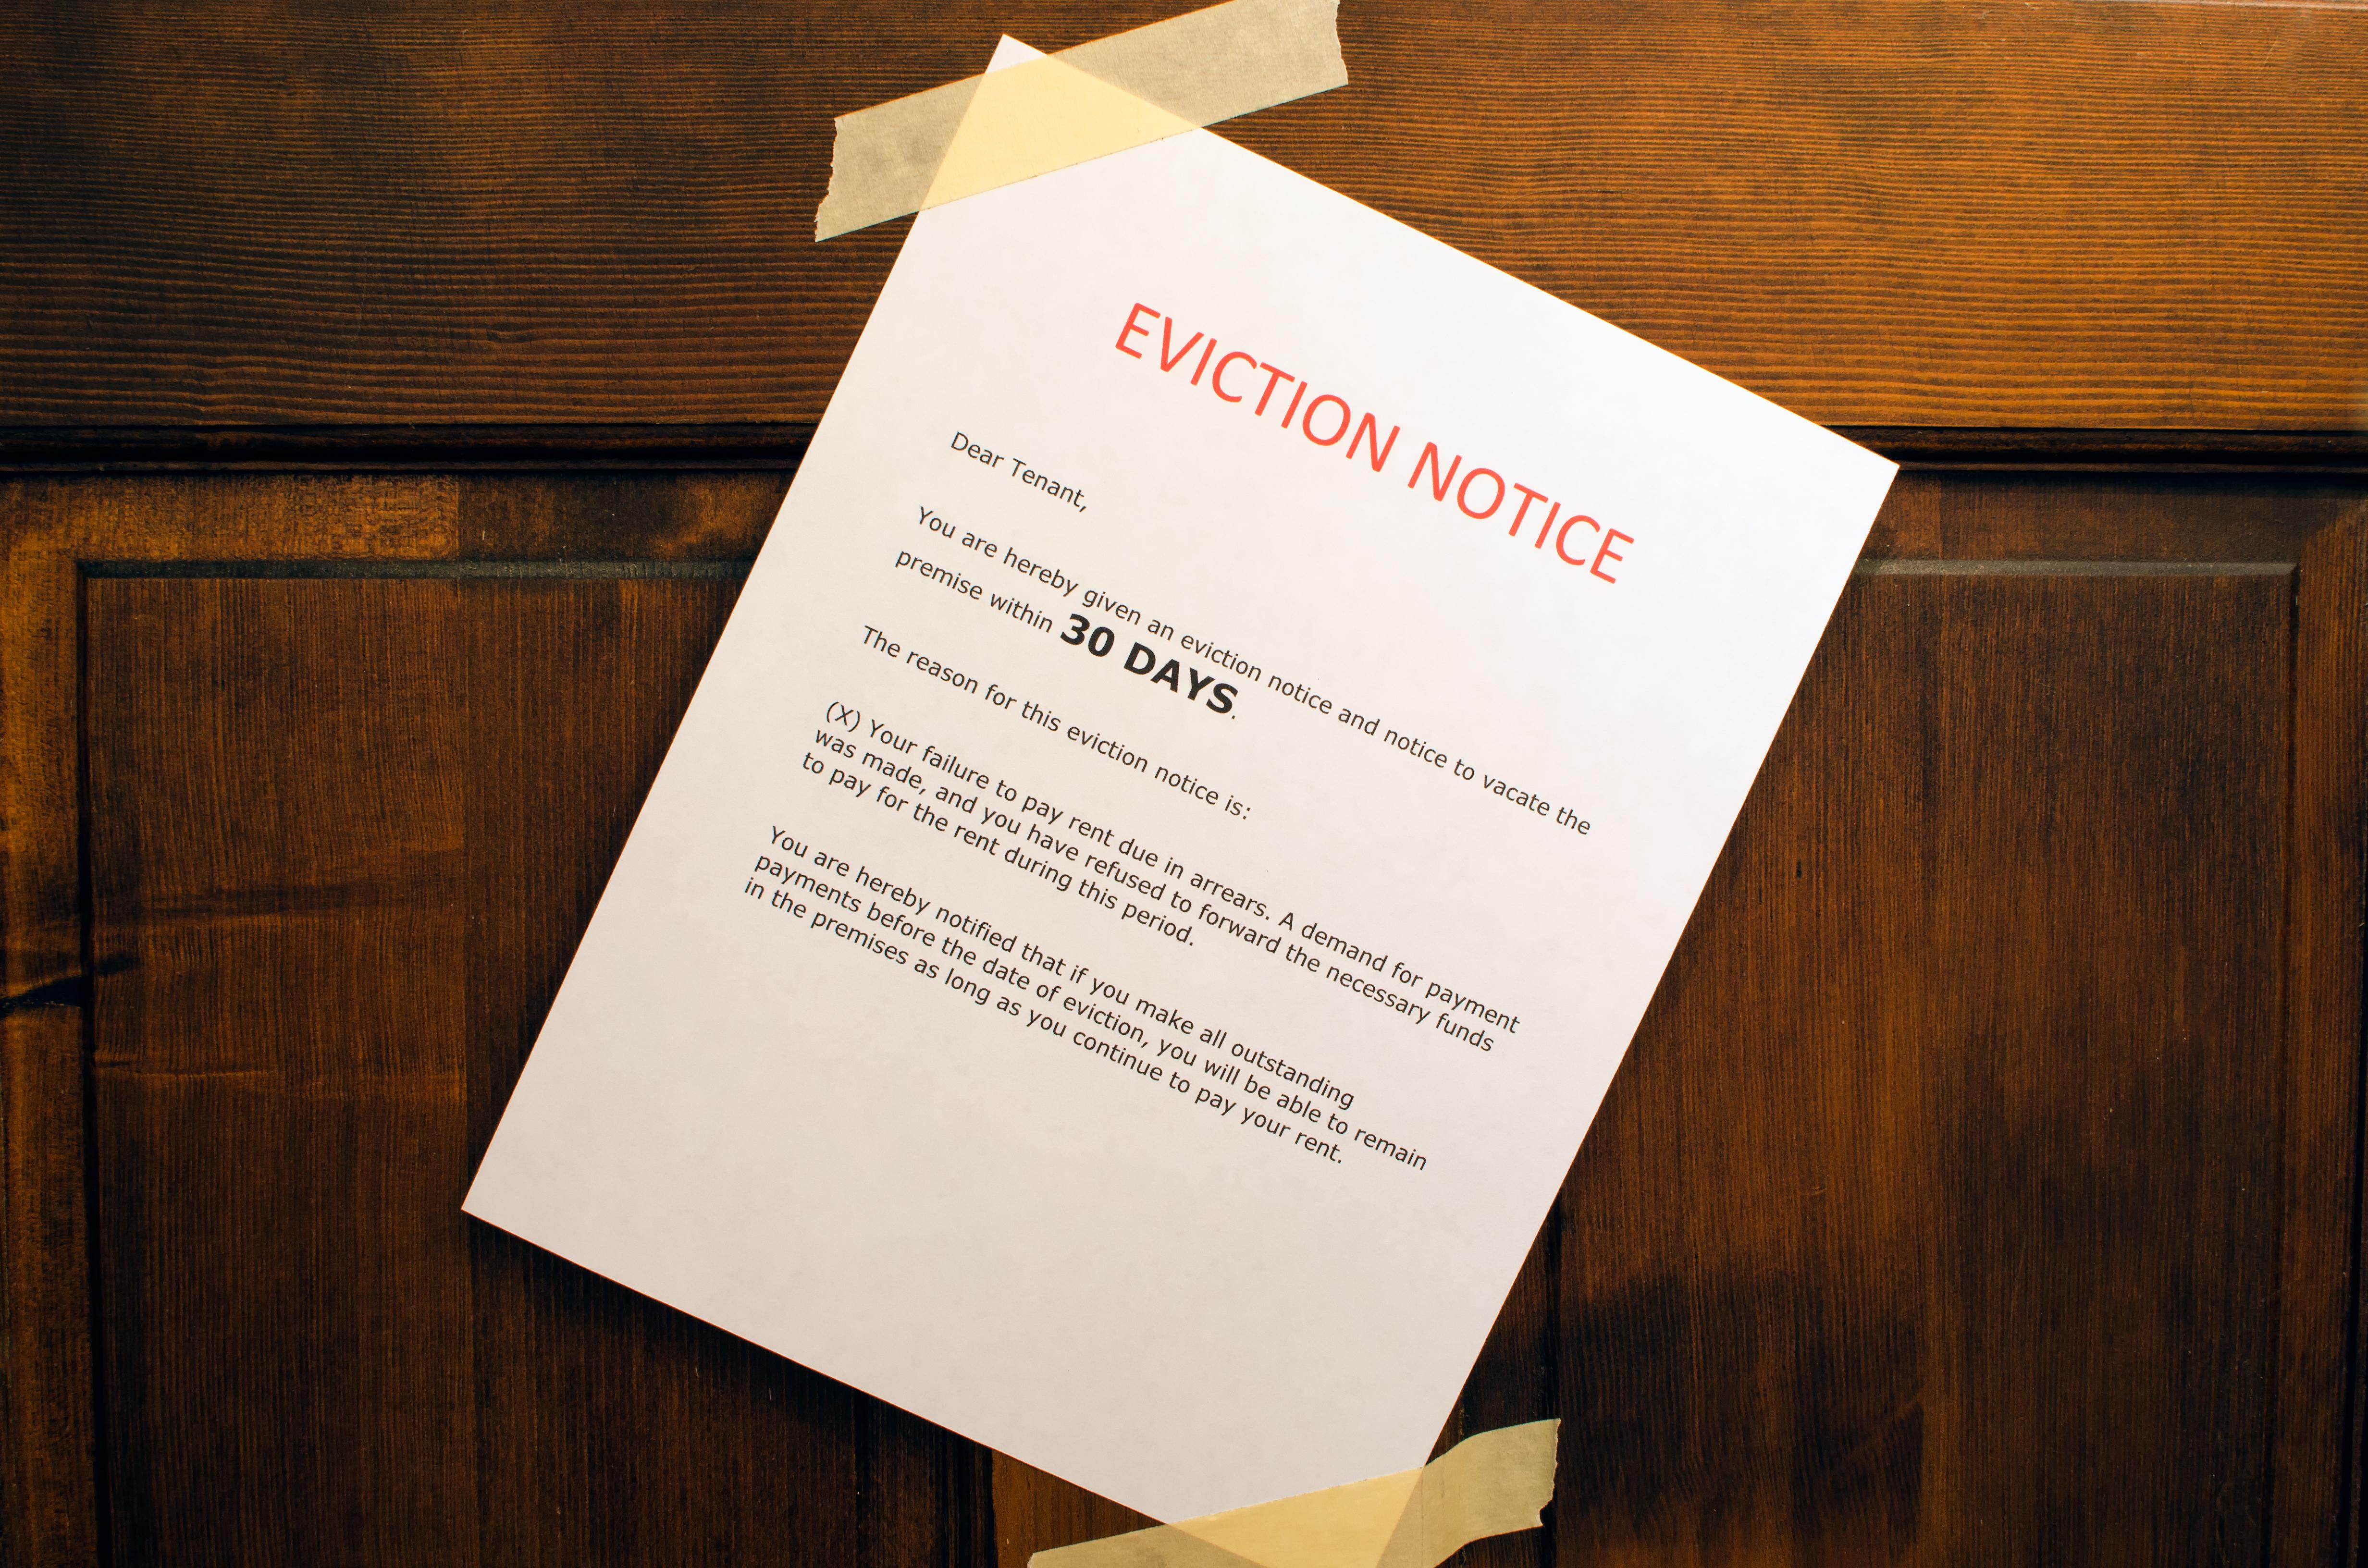 Pennsylvania Eviction Rules With No Lease Legalbeagle